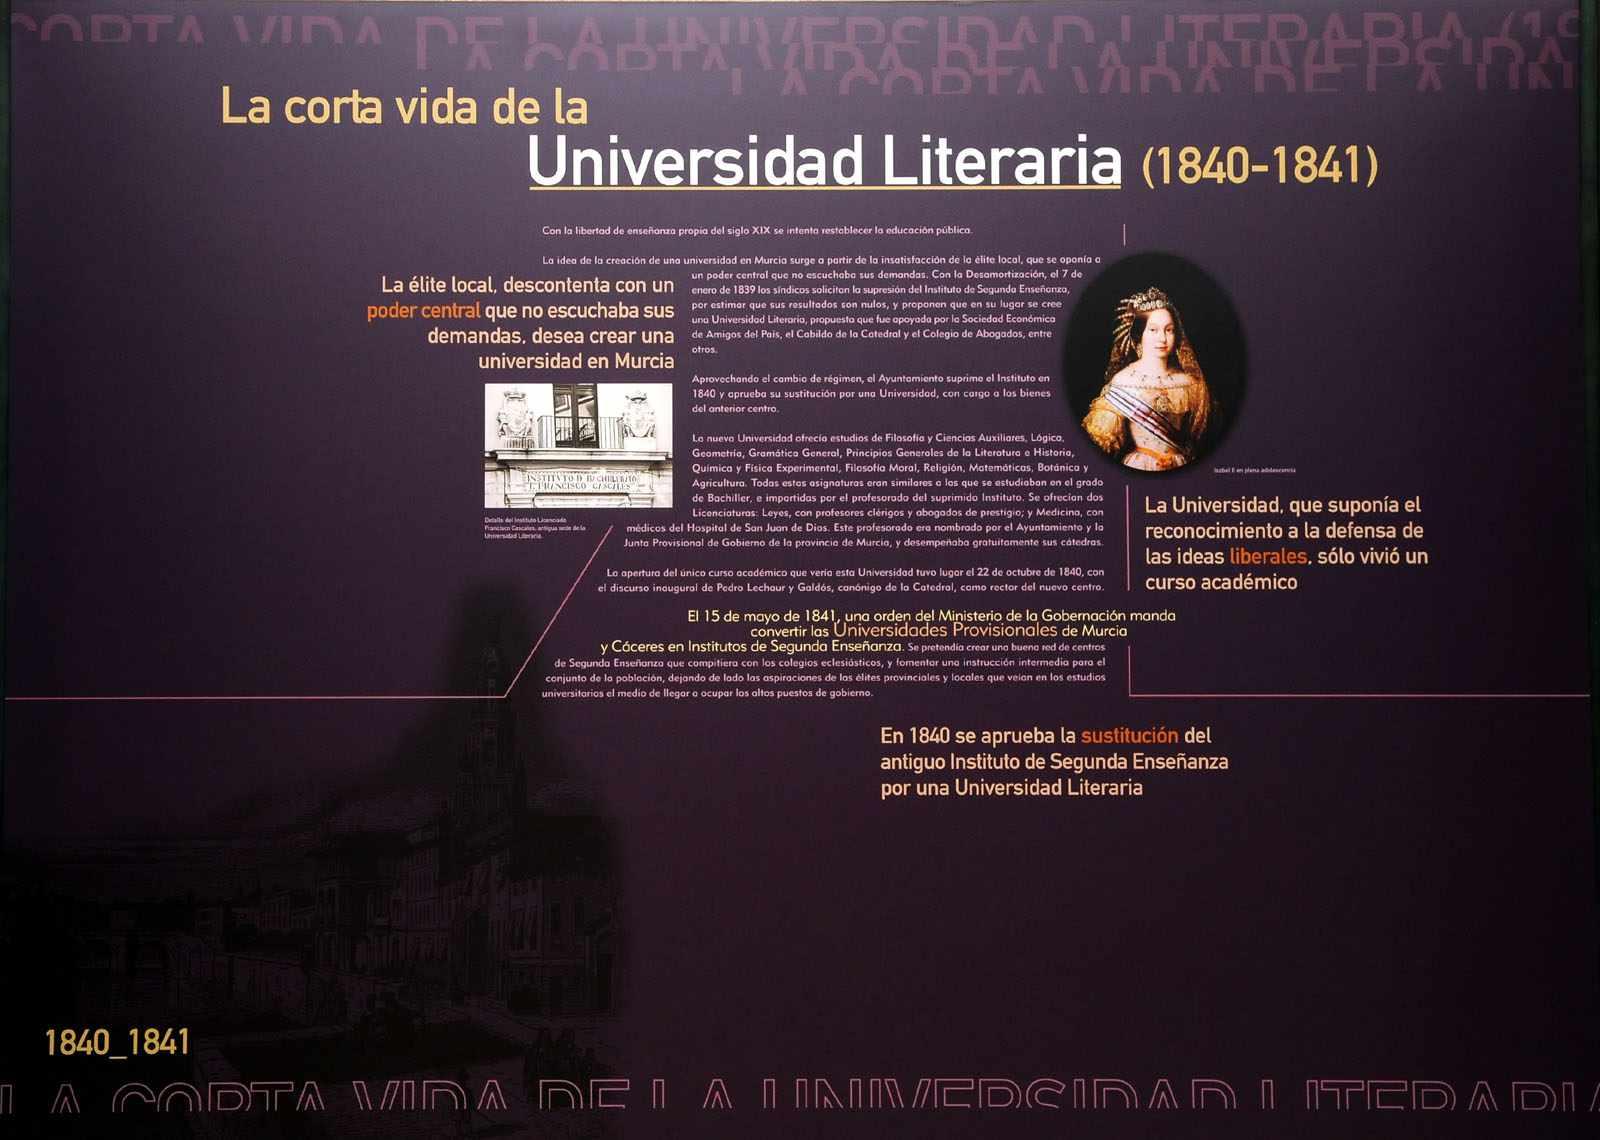 La corta vida de la Universidad Literaria (1840-1841)